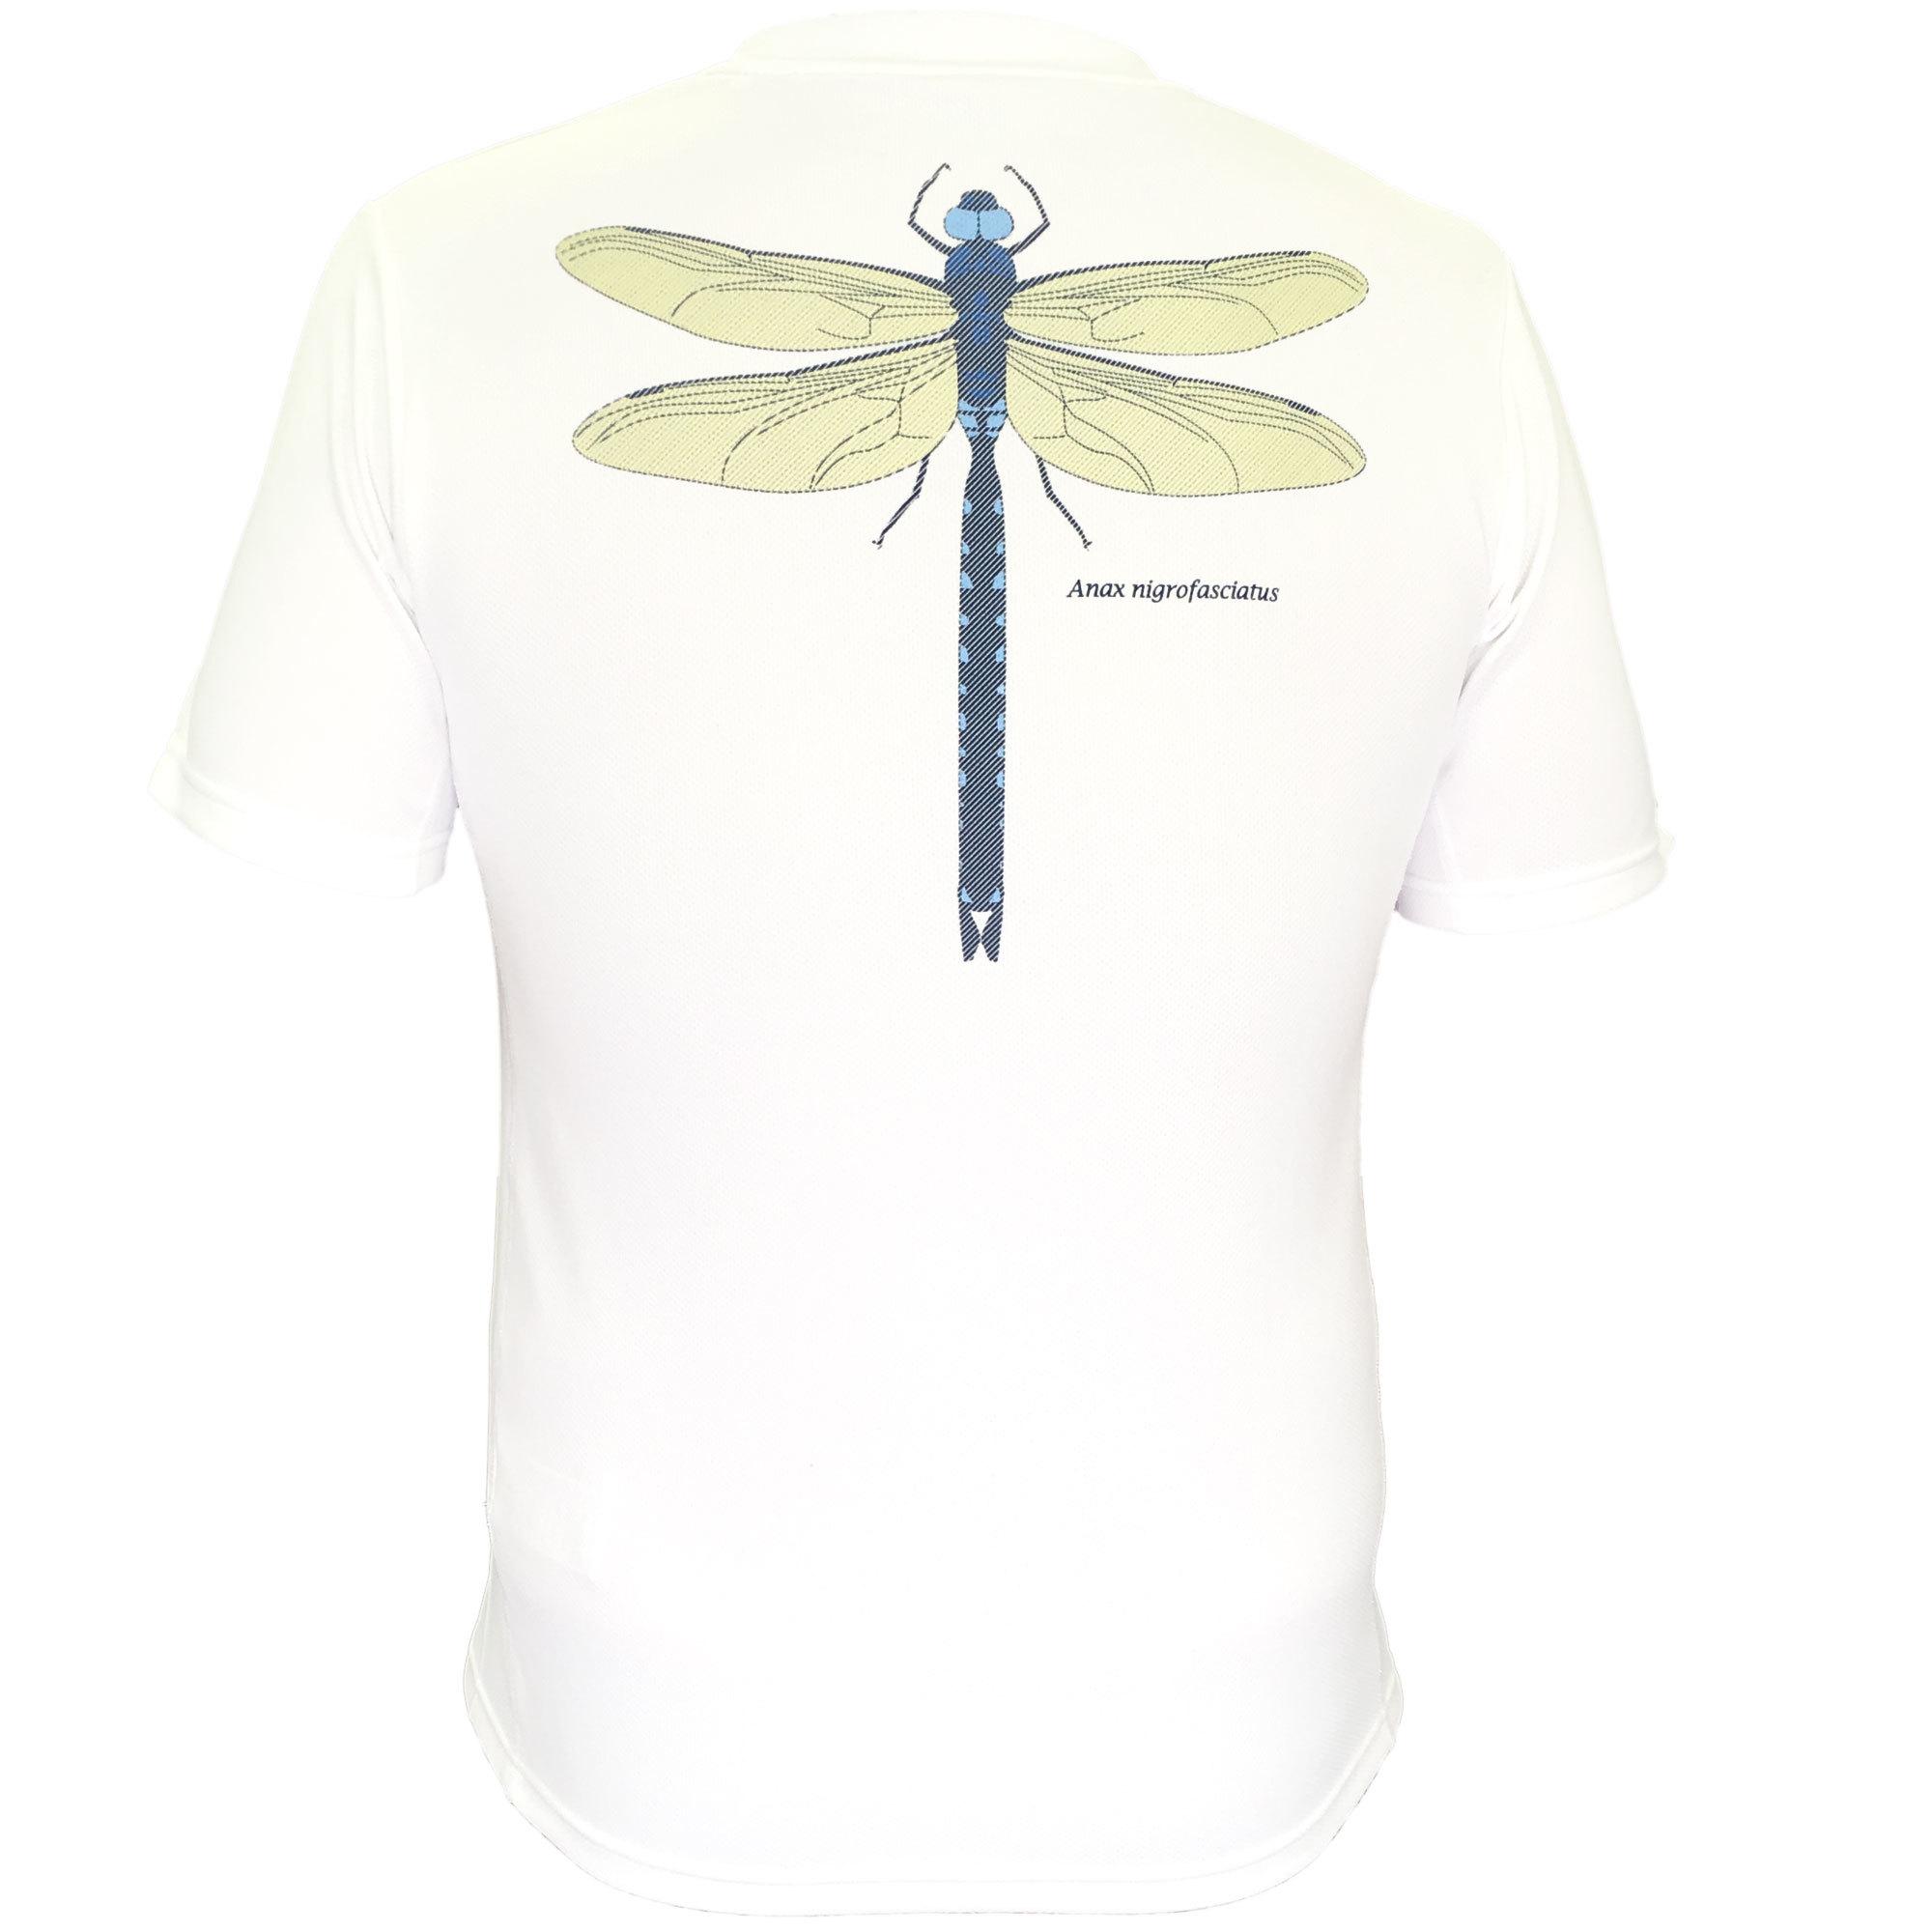 P818TSM01 吸水速乾 UV メンズプリントTシャツ (ホワイト)